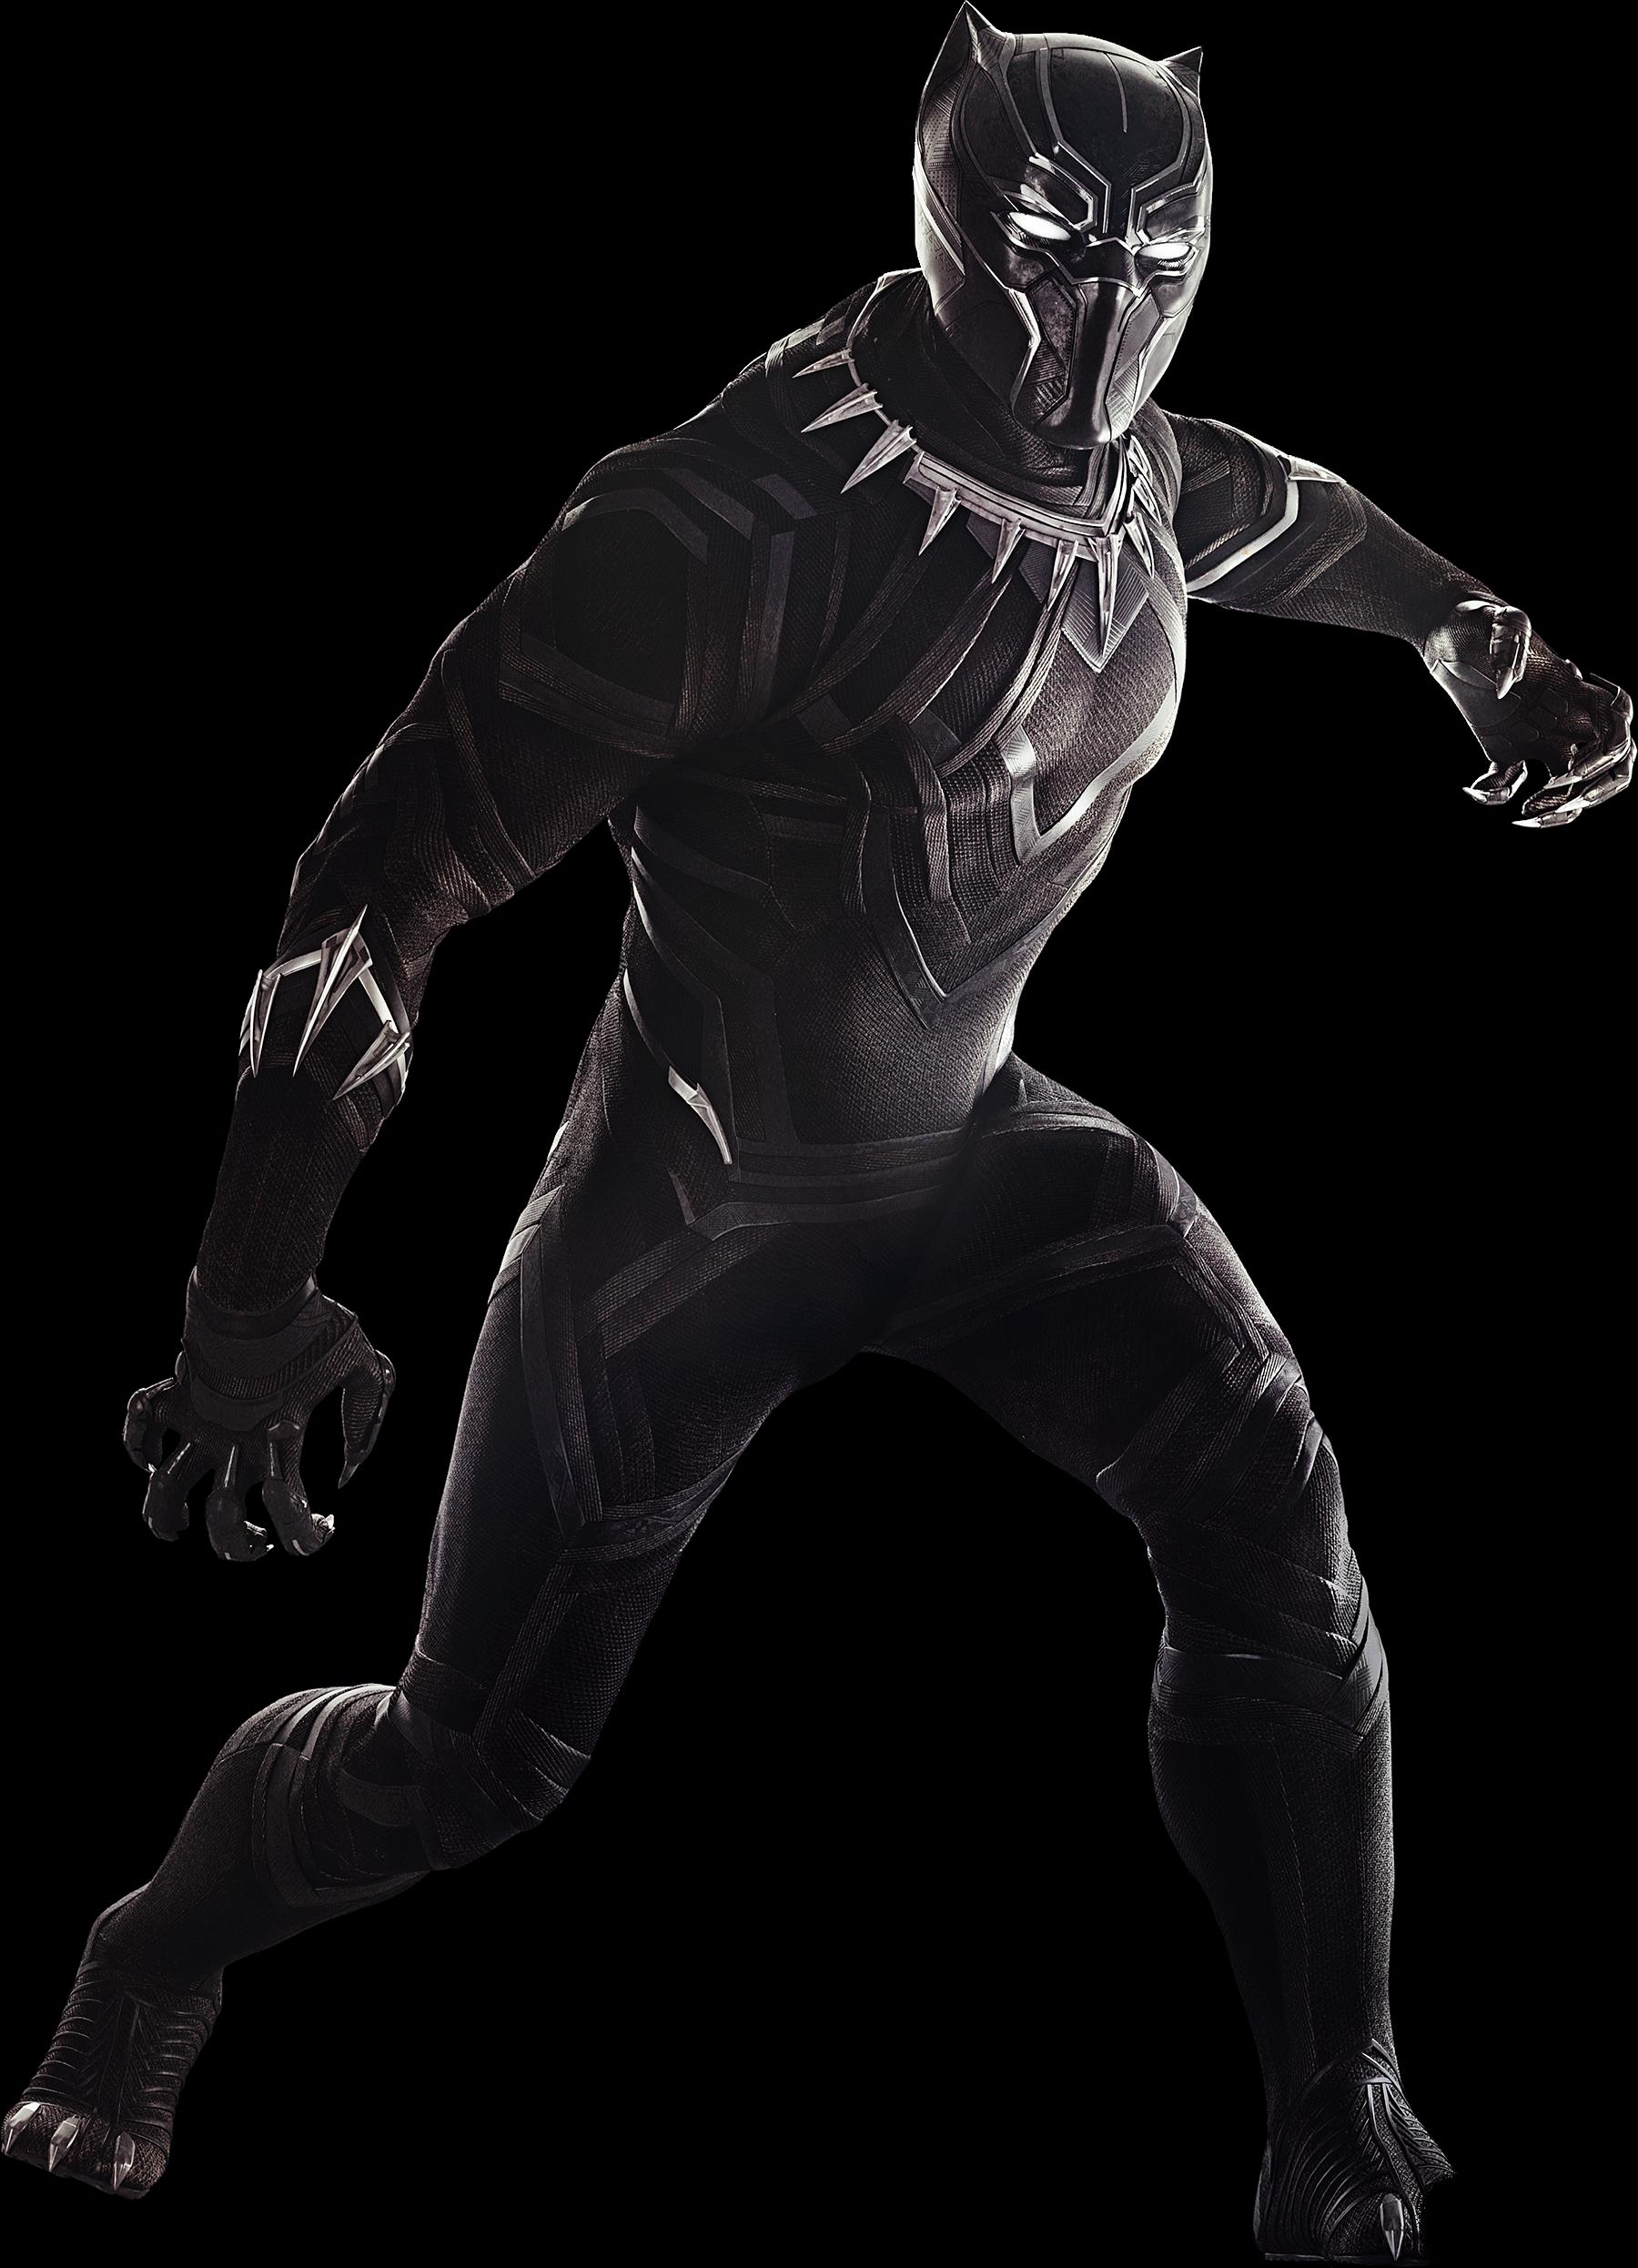 Black Panther PNG - 26502